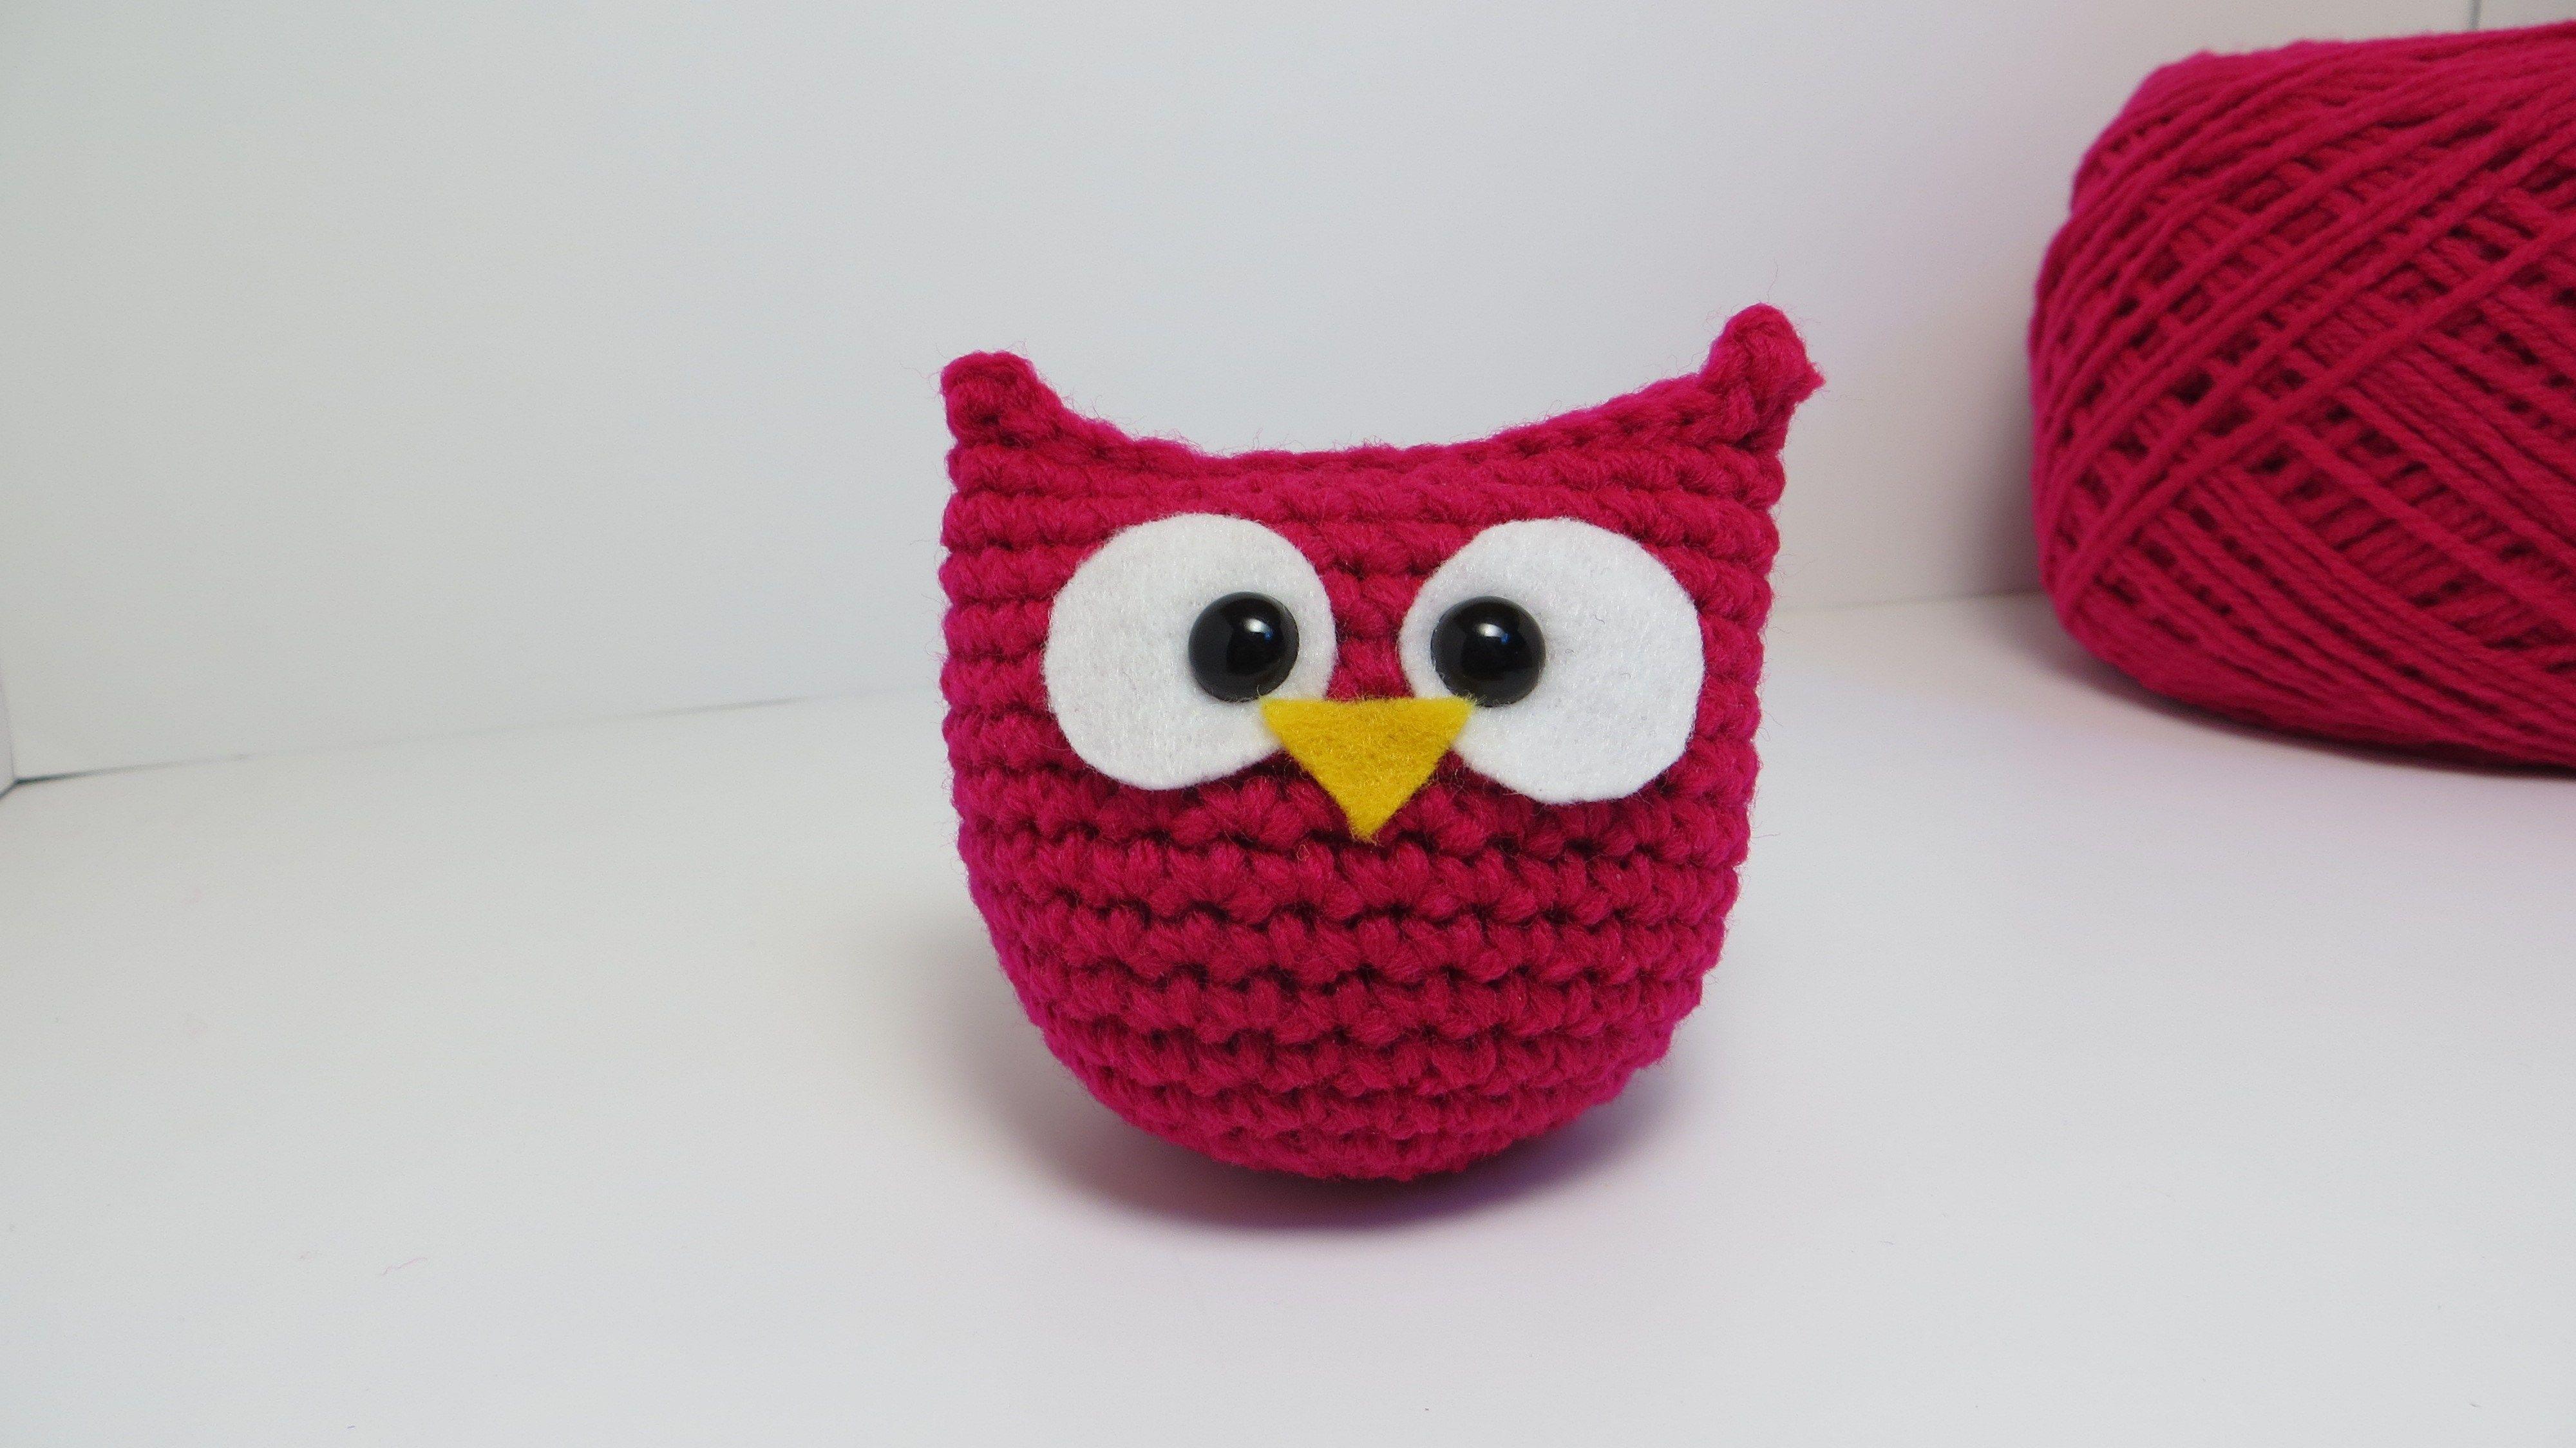 IMG_2987 | Crochet - Amigurumi | Pinterest